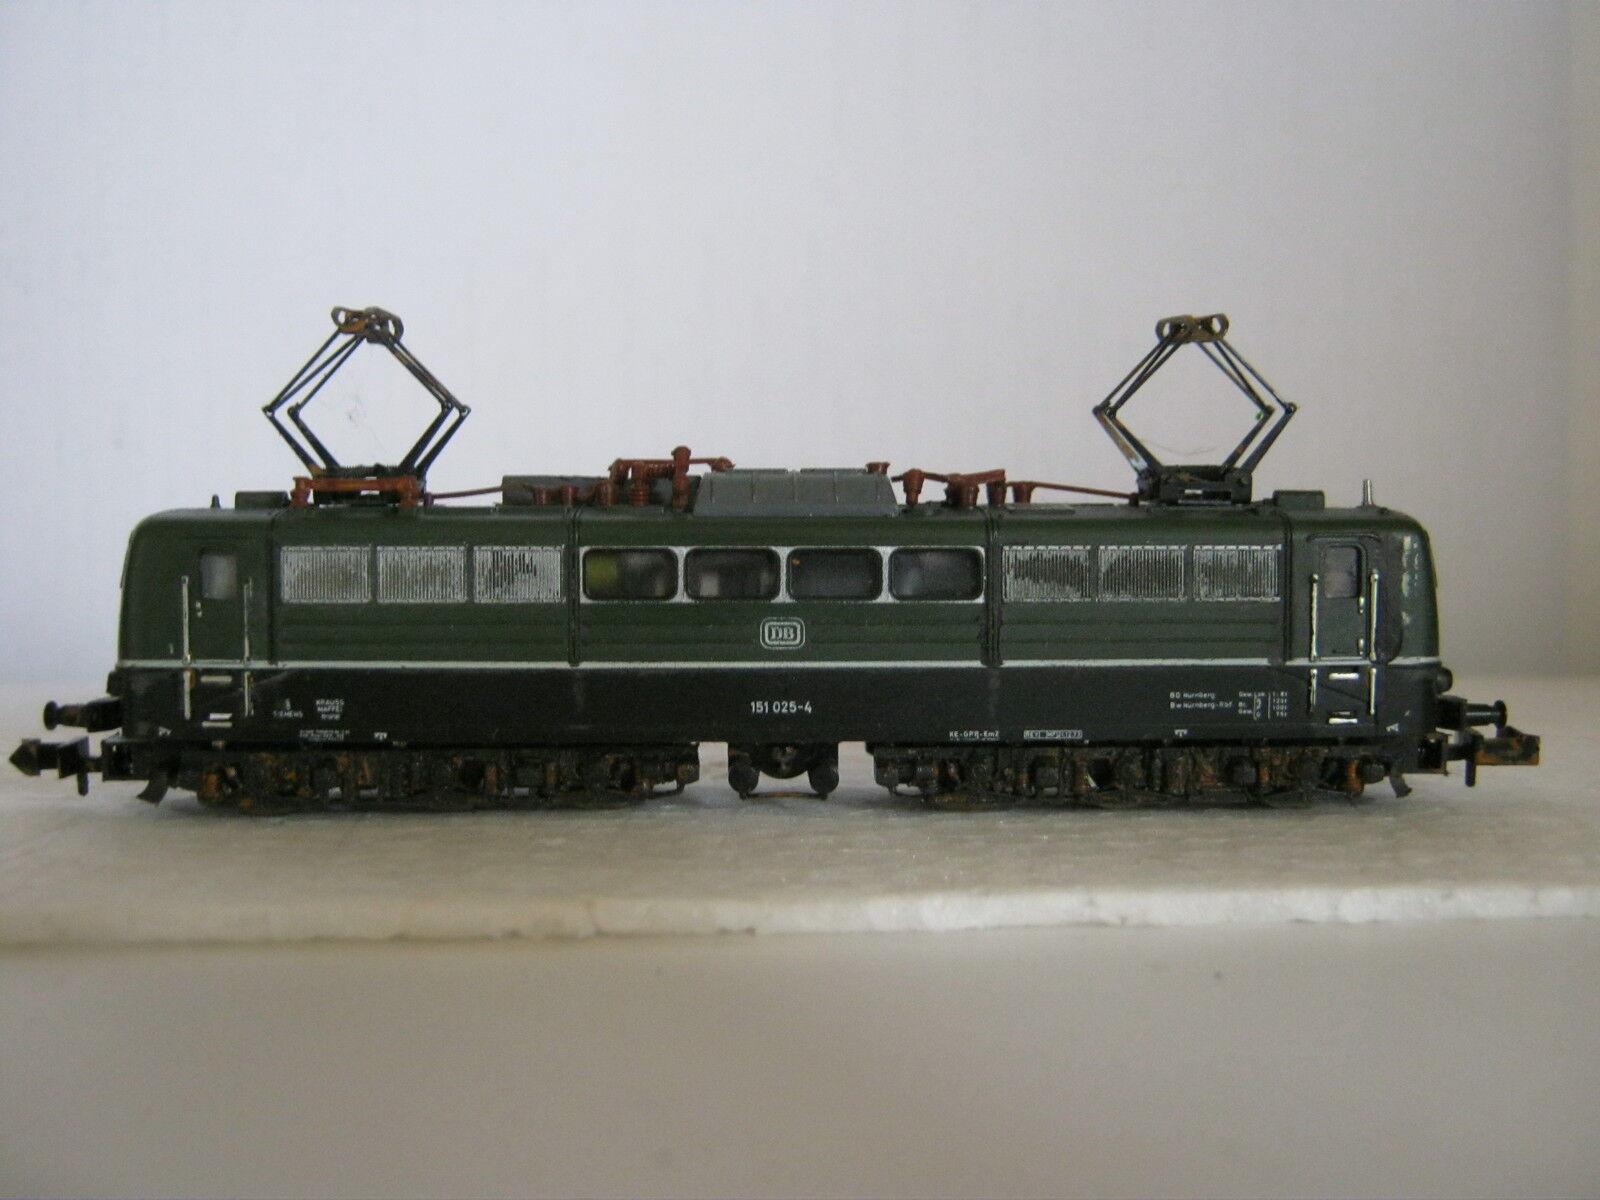 Minitrix N 2056 Elektro Lok BR 151 151 151 025-4 DB grün (RG AE 49L36-1)  | Optimaler Preis  eeaf05